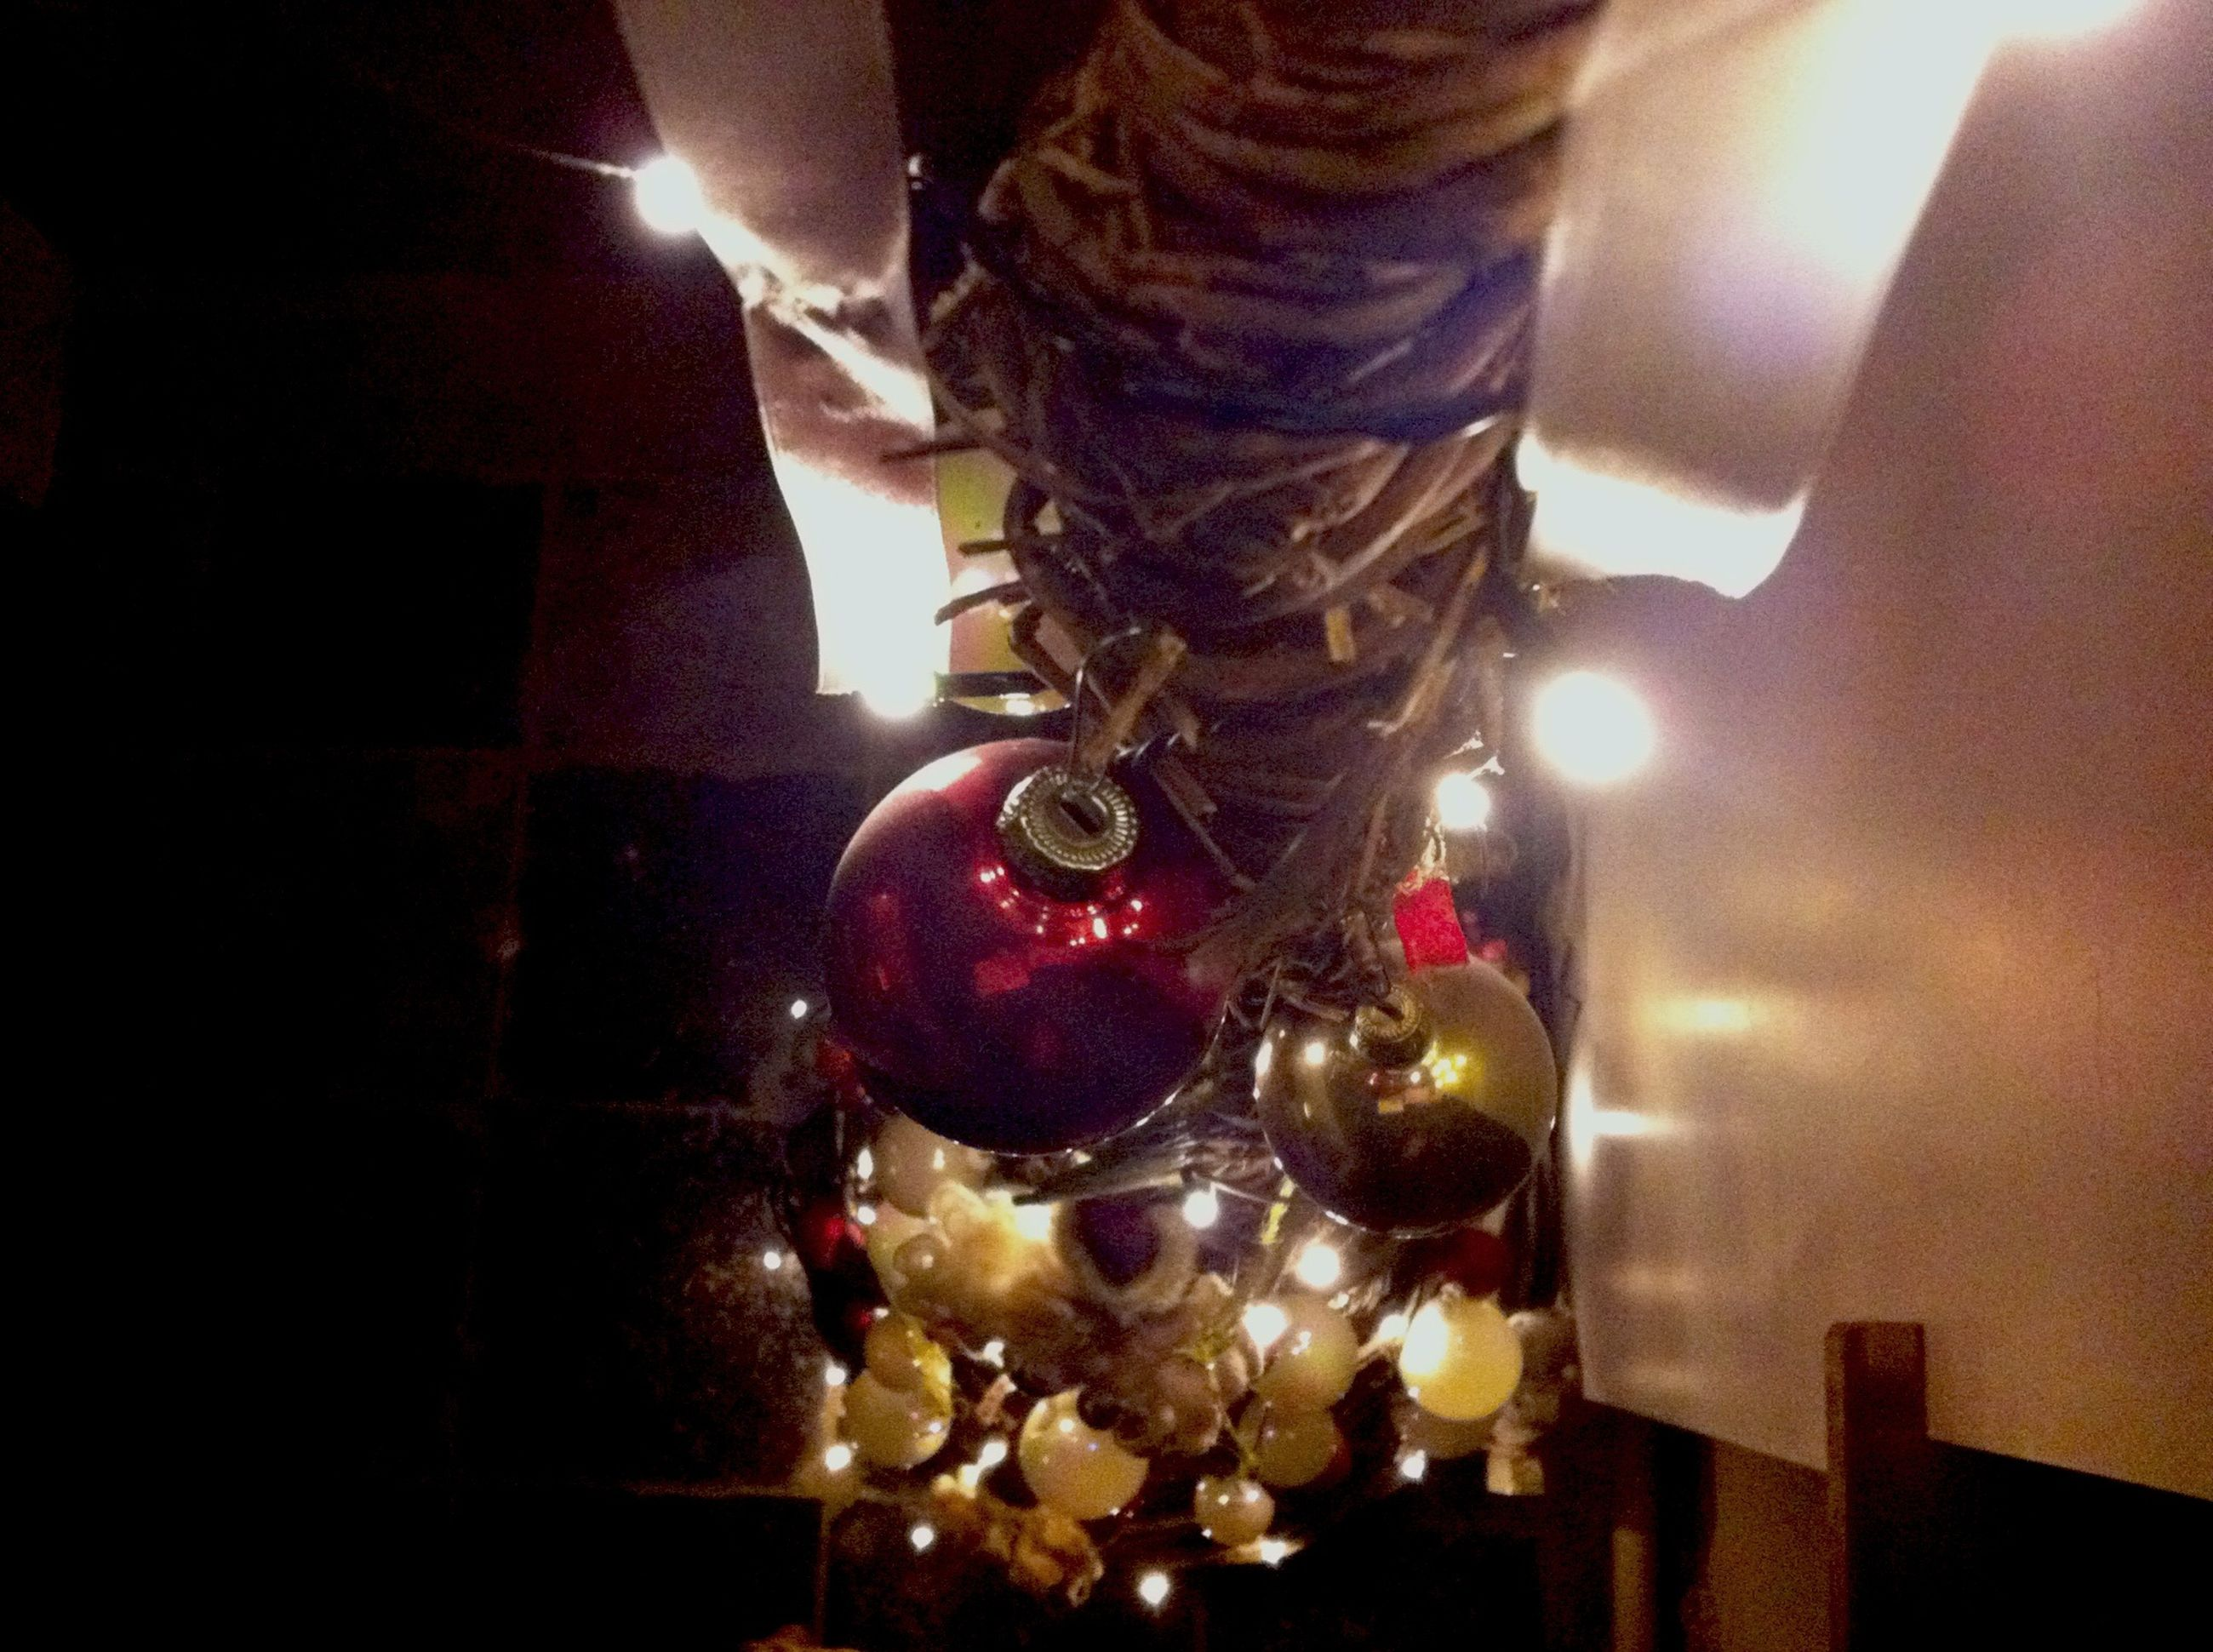 illuminated, indoors, night, lighting equipment, glowing, candle, decoration, burning, celebration, flame, light - natural phenomenon, lit, home interior, hanging, fire - natural phenomenon, tradition, electric light, christmas, table, christmas decoration